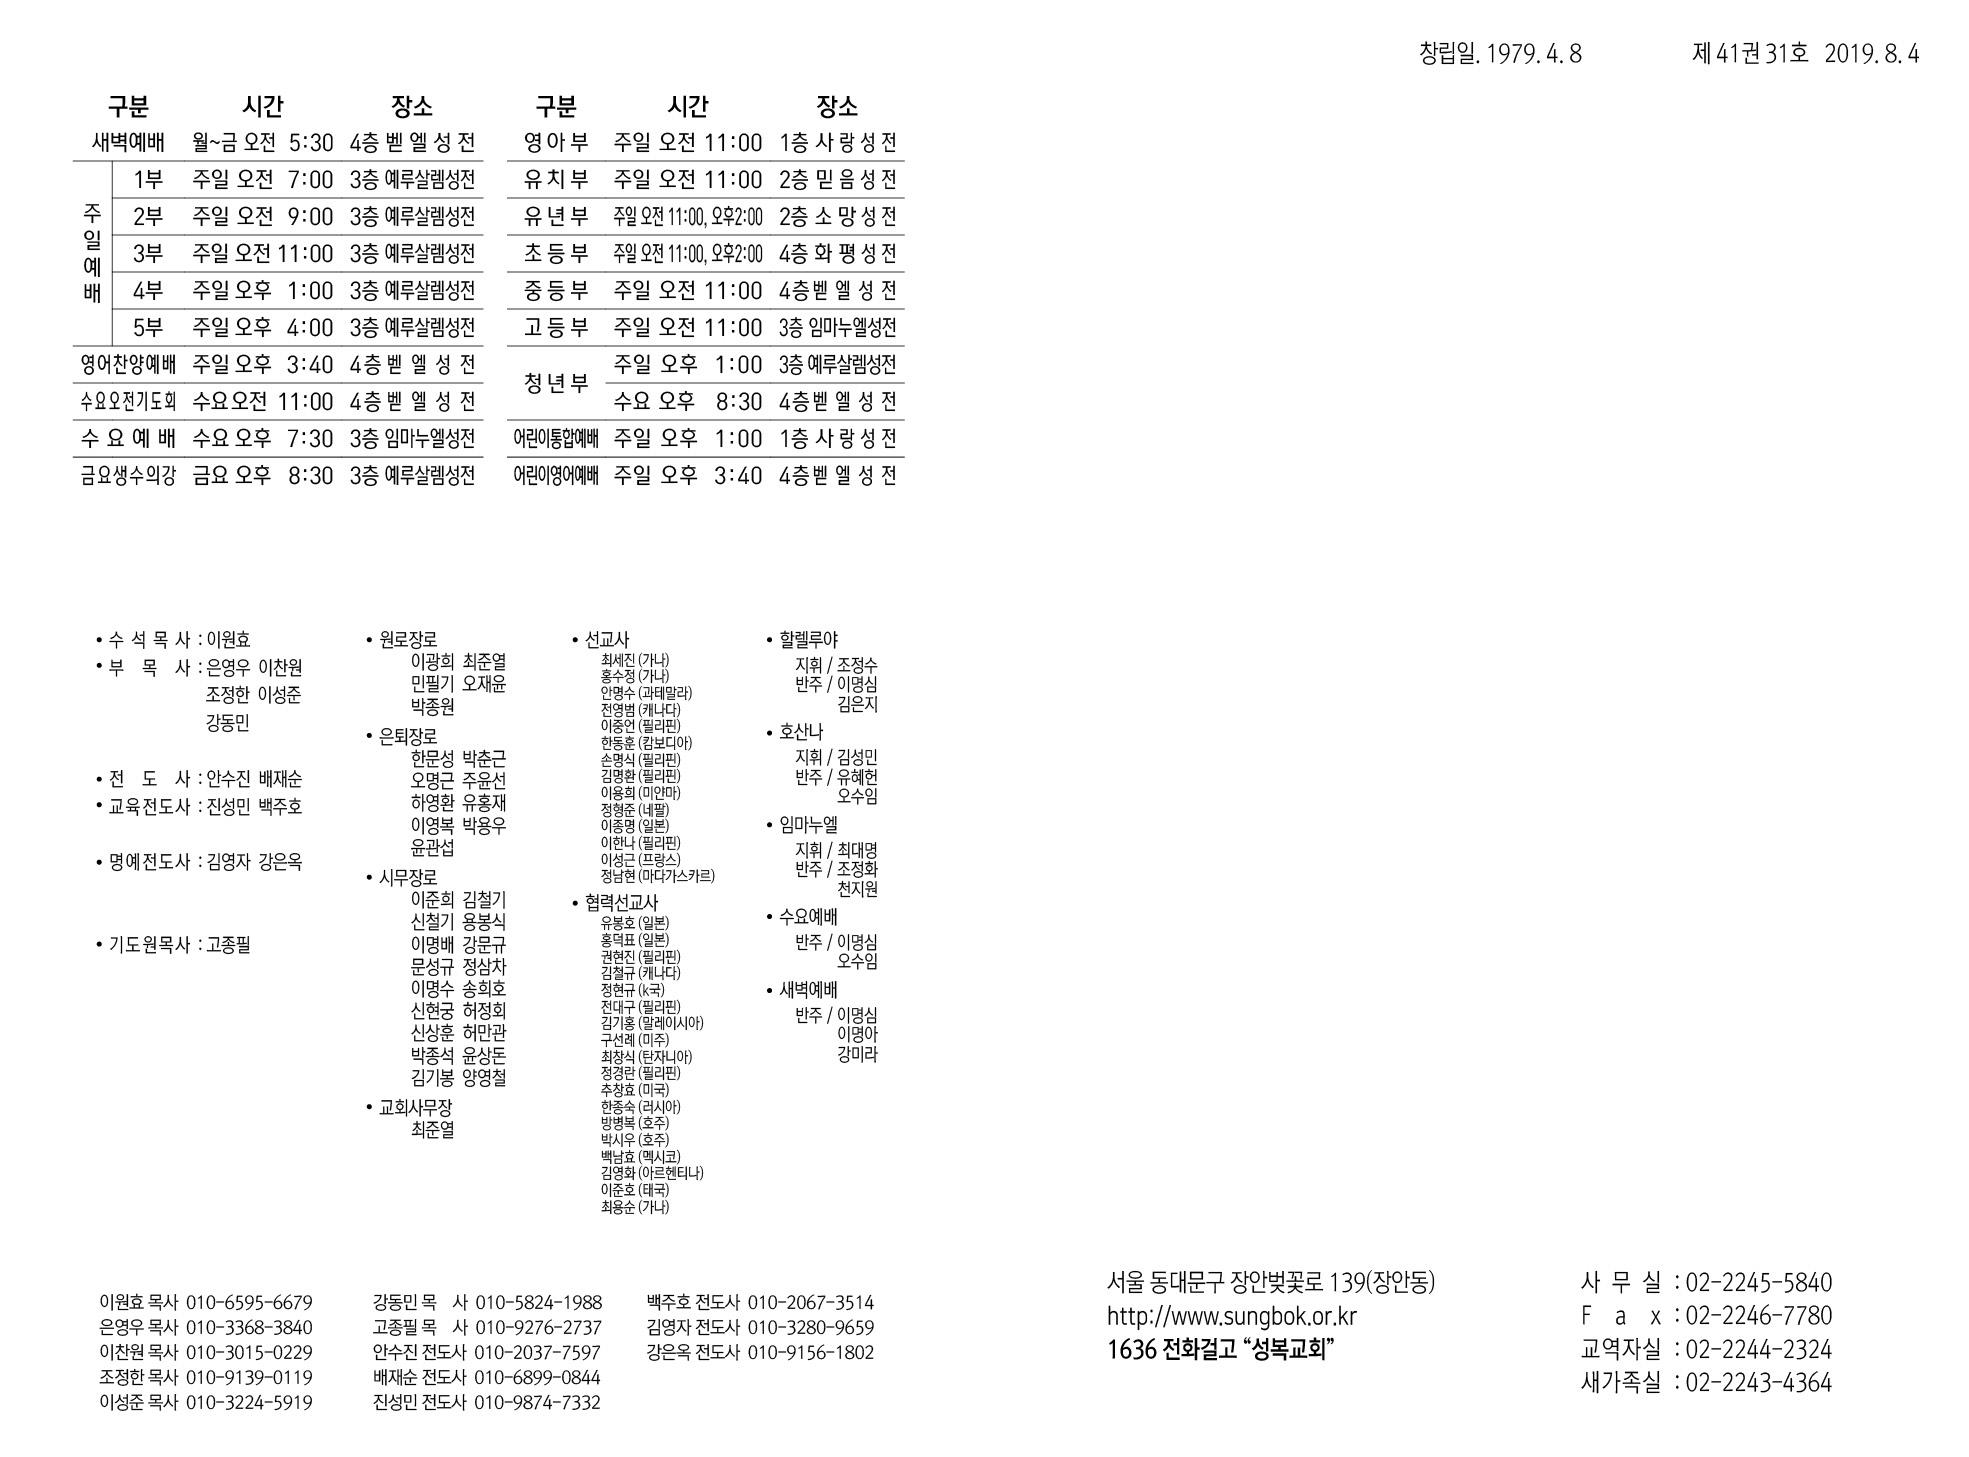 7bf95a204825ed73c4410cbff6bbceae.jpg